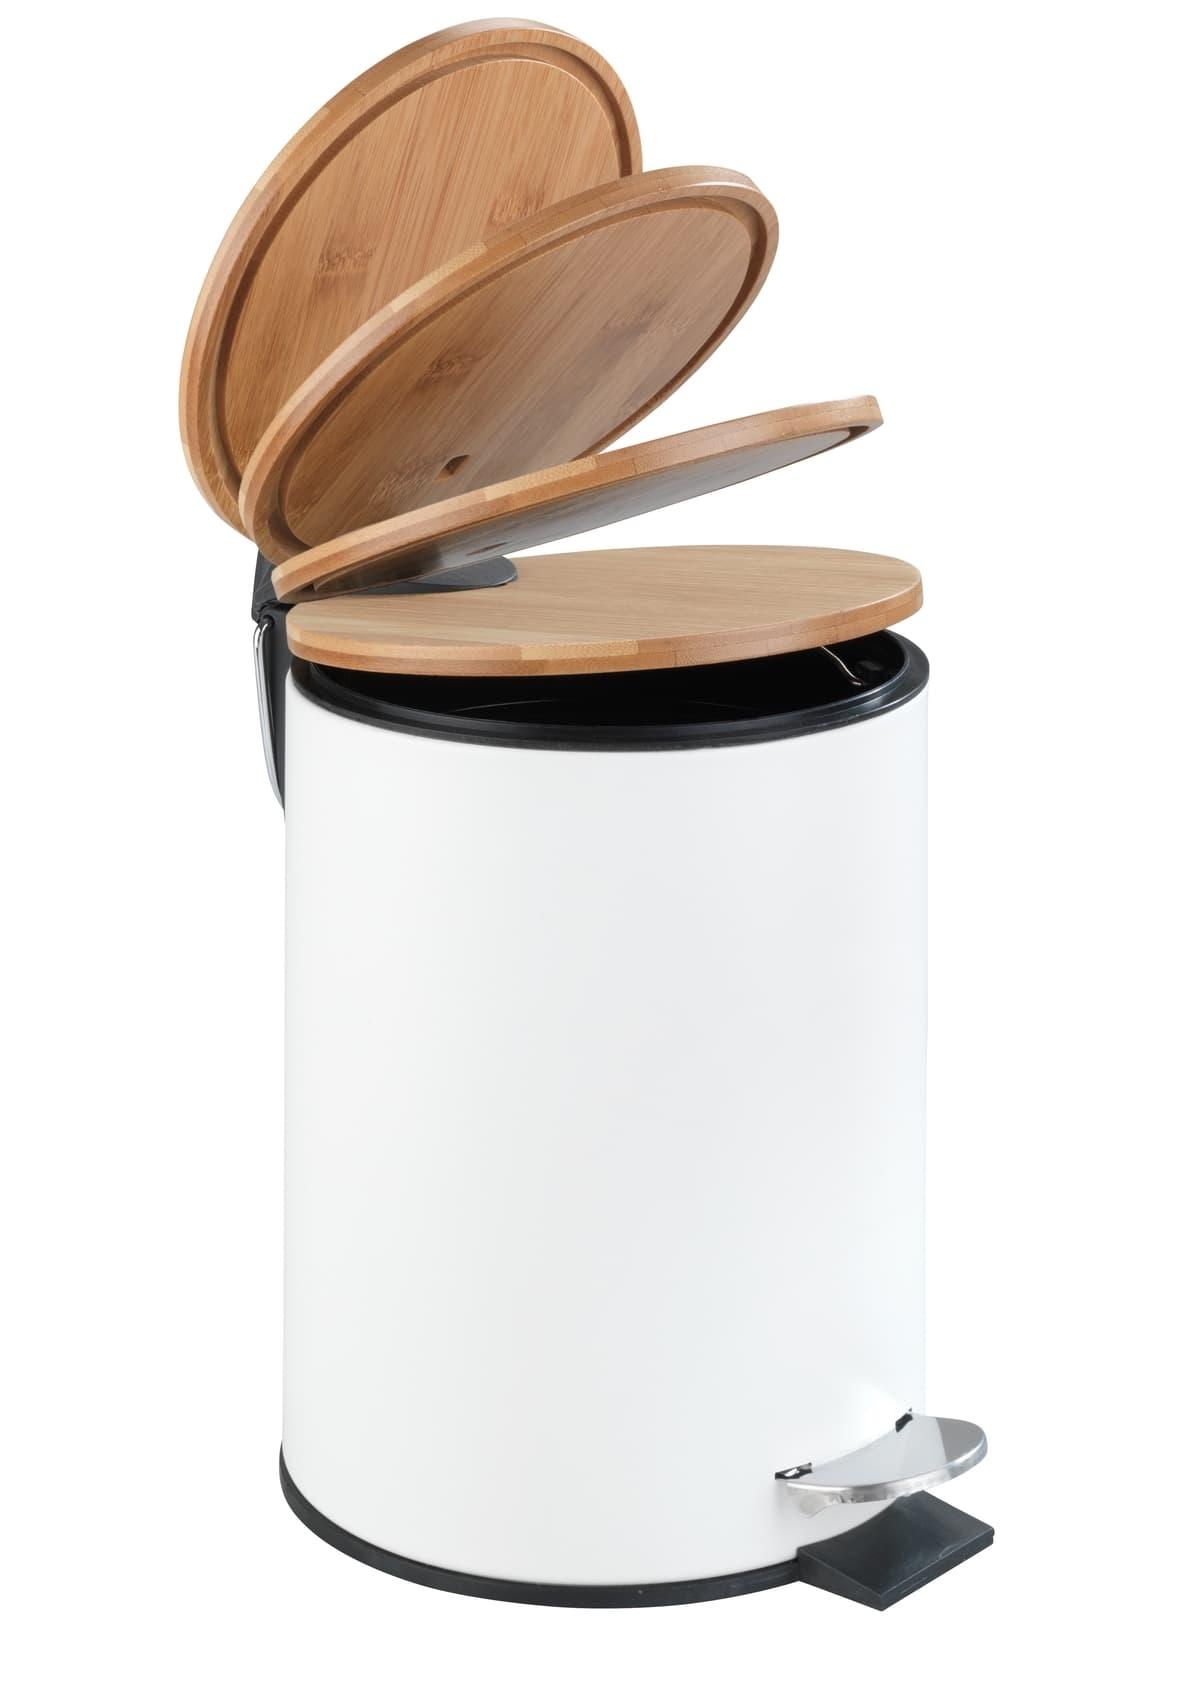 Cos de gunoi cu pedala Easy-Close, din otel inoxidabil, Torto Alb, 3L, Ø17xH23,5 cm imagine